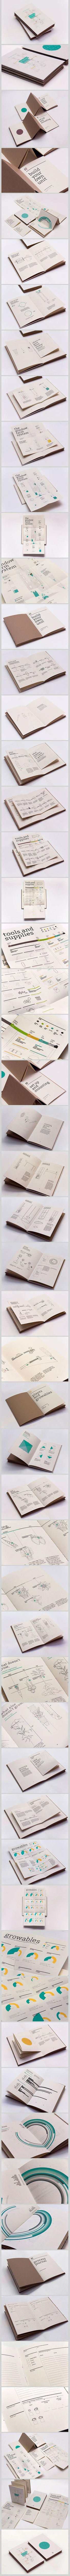 Window Farms: Information Design Book by Jiani Lu | #print #editorial